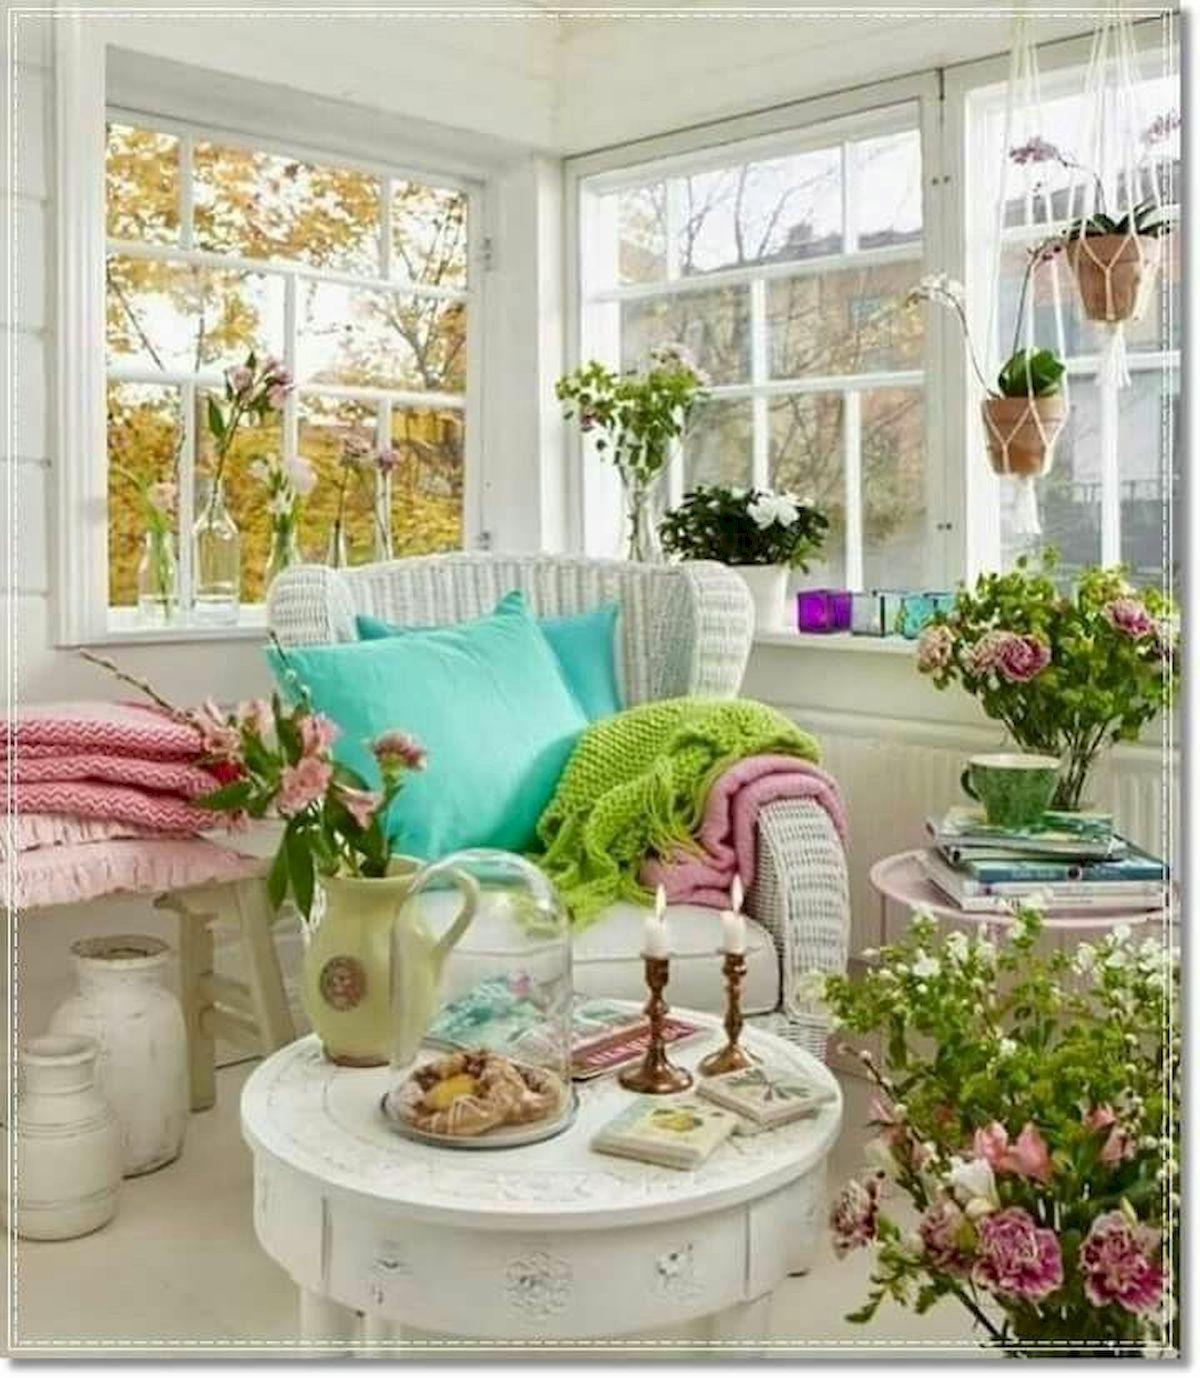 45 Colorful Interior Home Design and Decor Ideas (8)